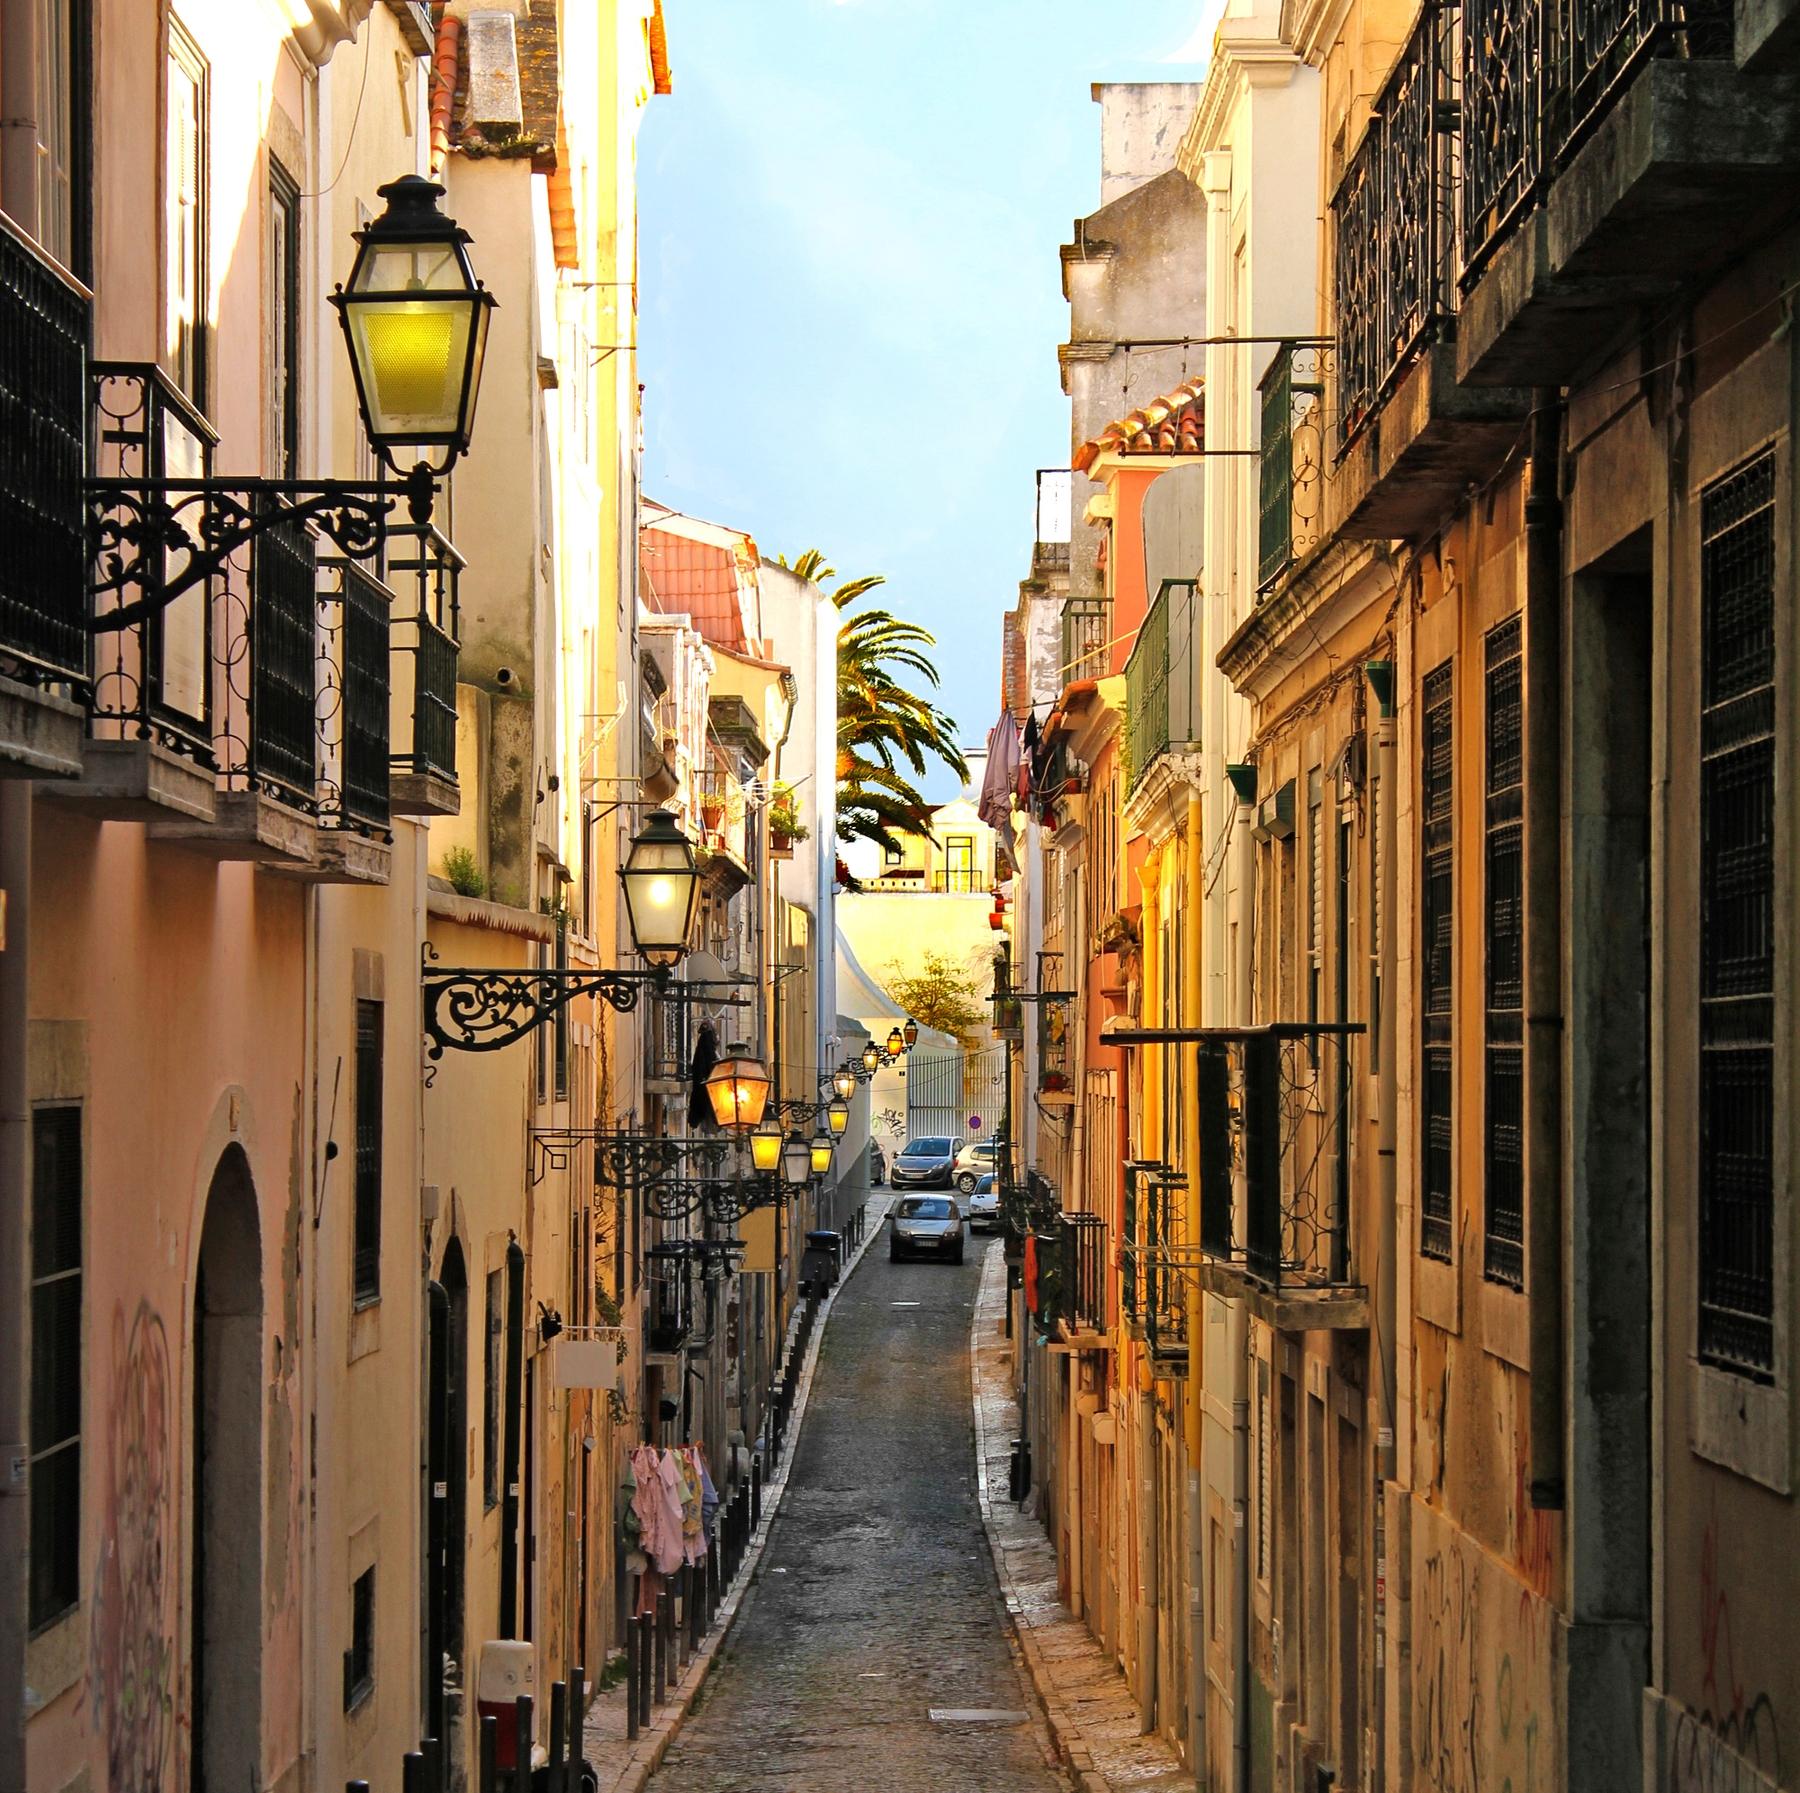 Stedentrip Europa Lissabon Portugal